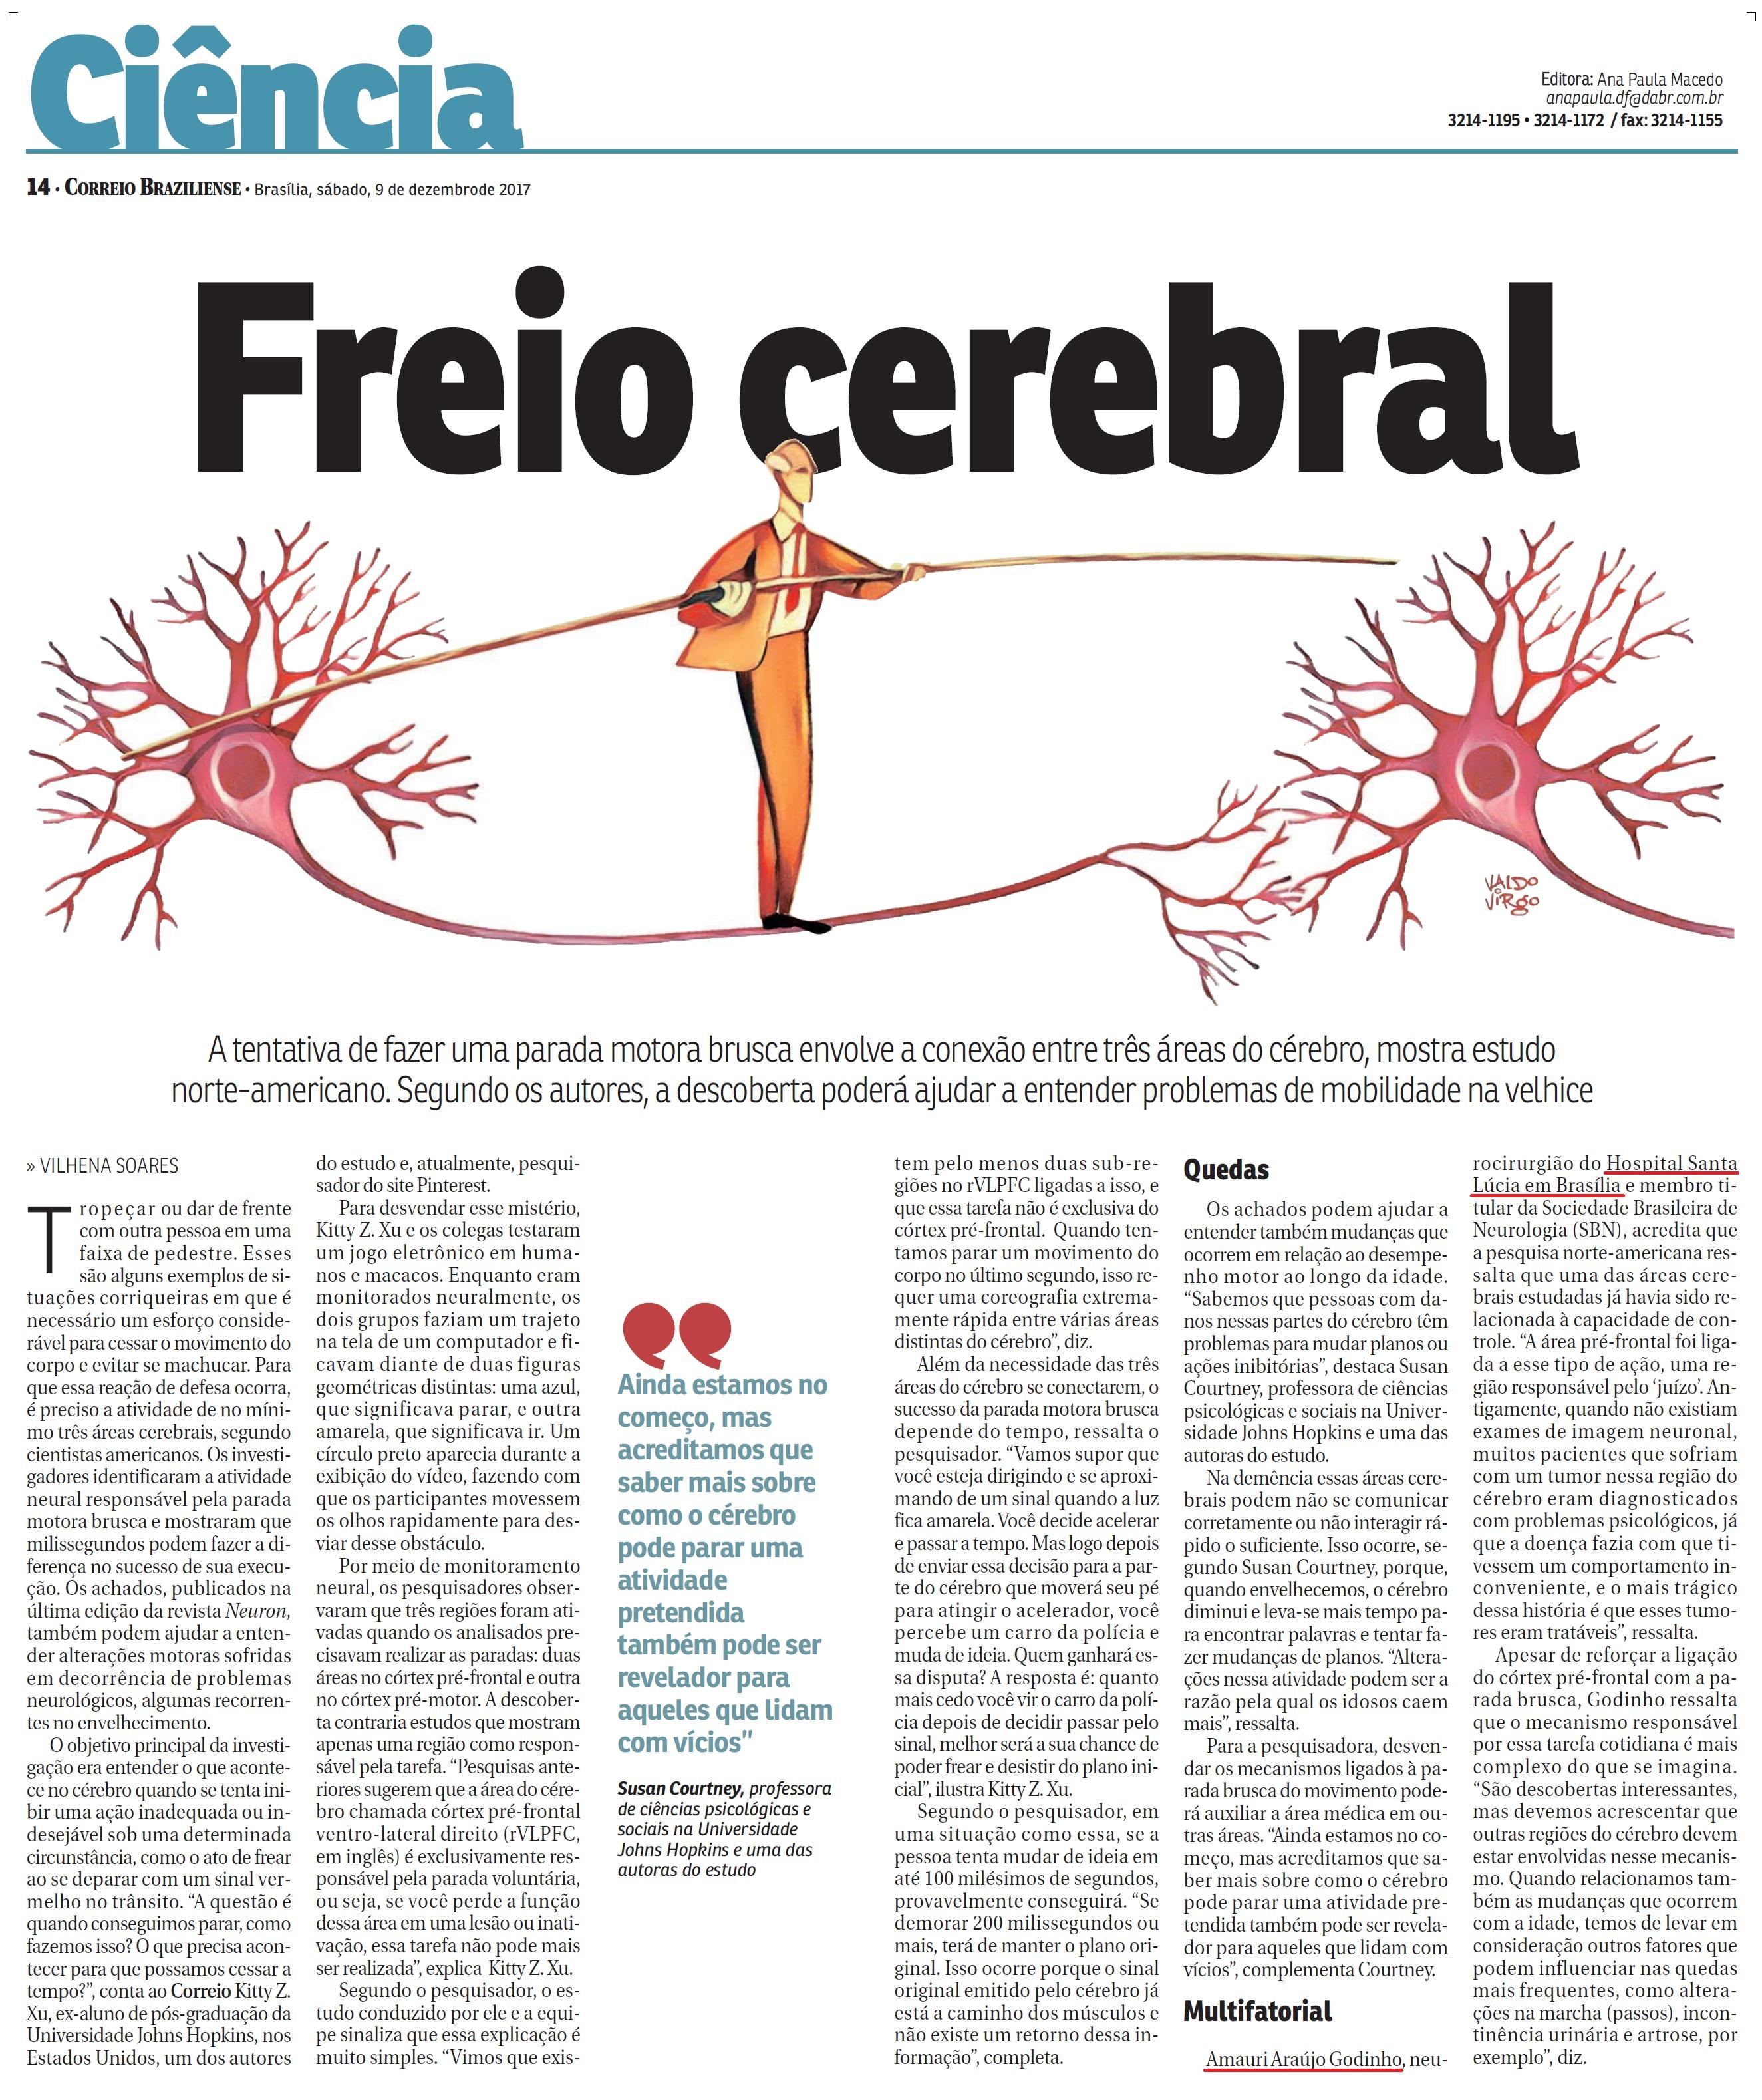 Correio Braziliense - Dr. Amauri Godinho HSL - 09-12-2017